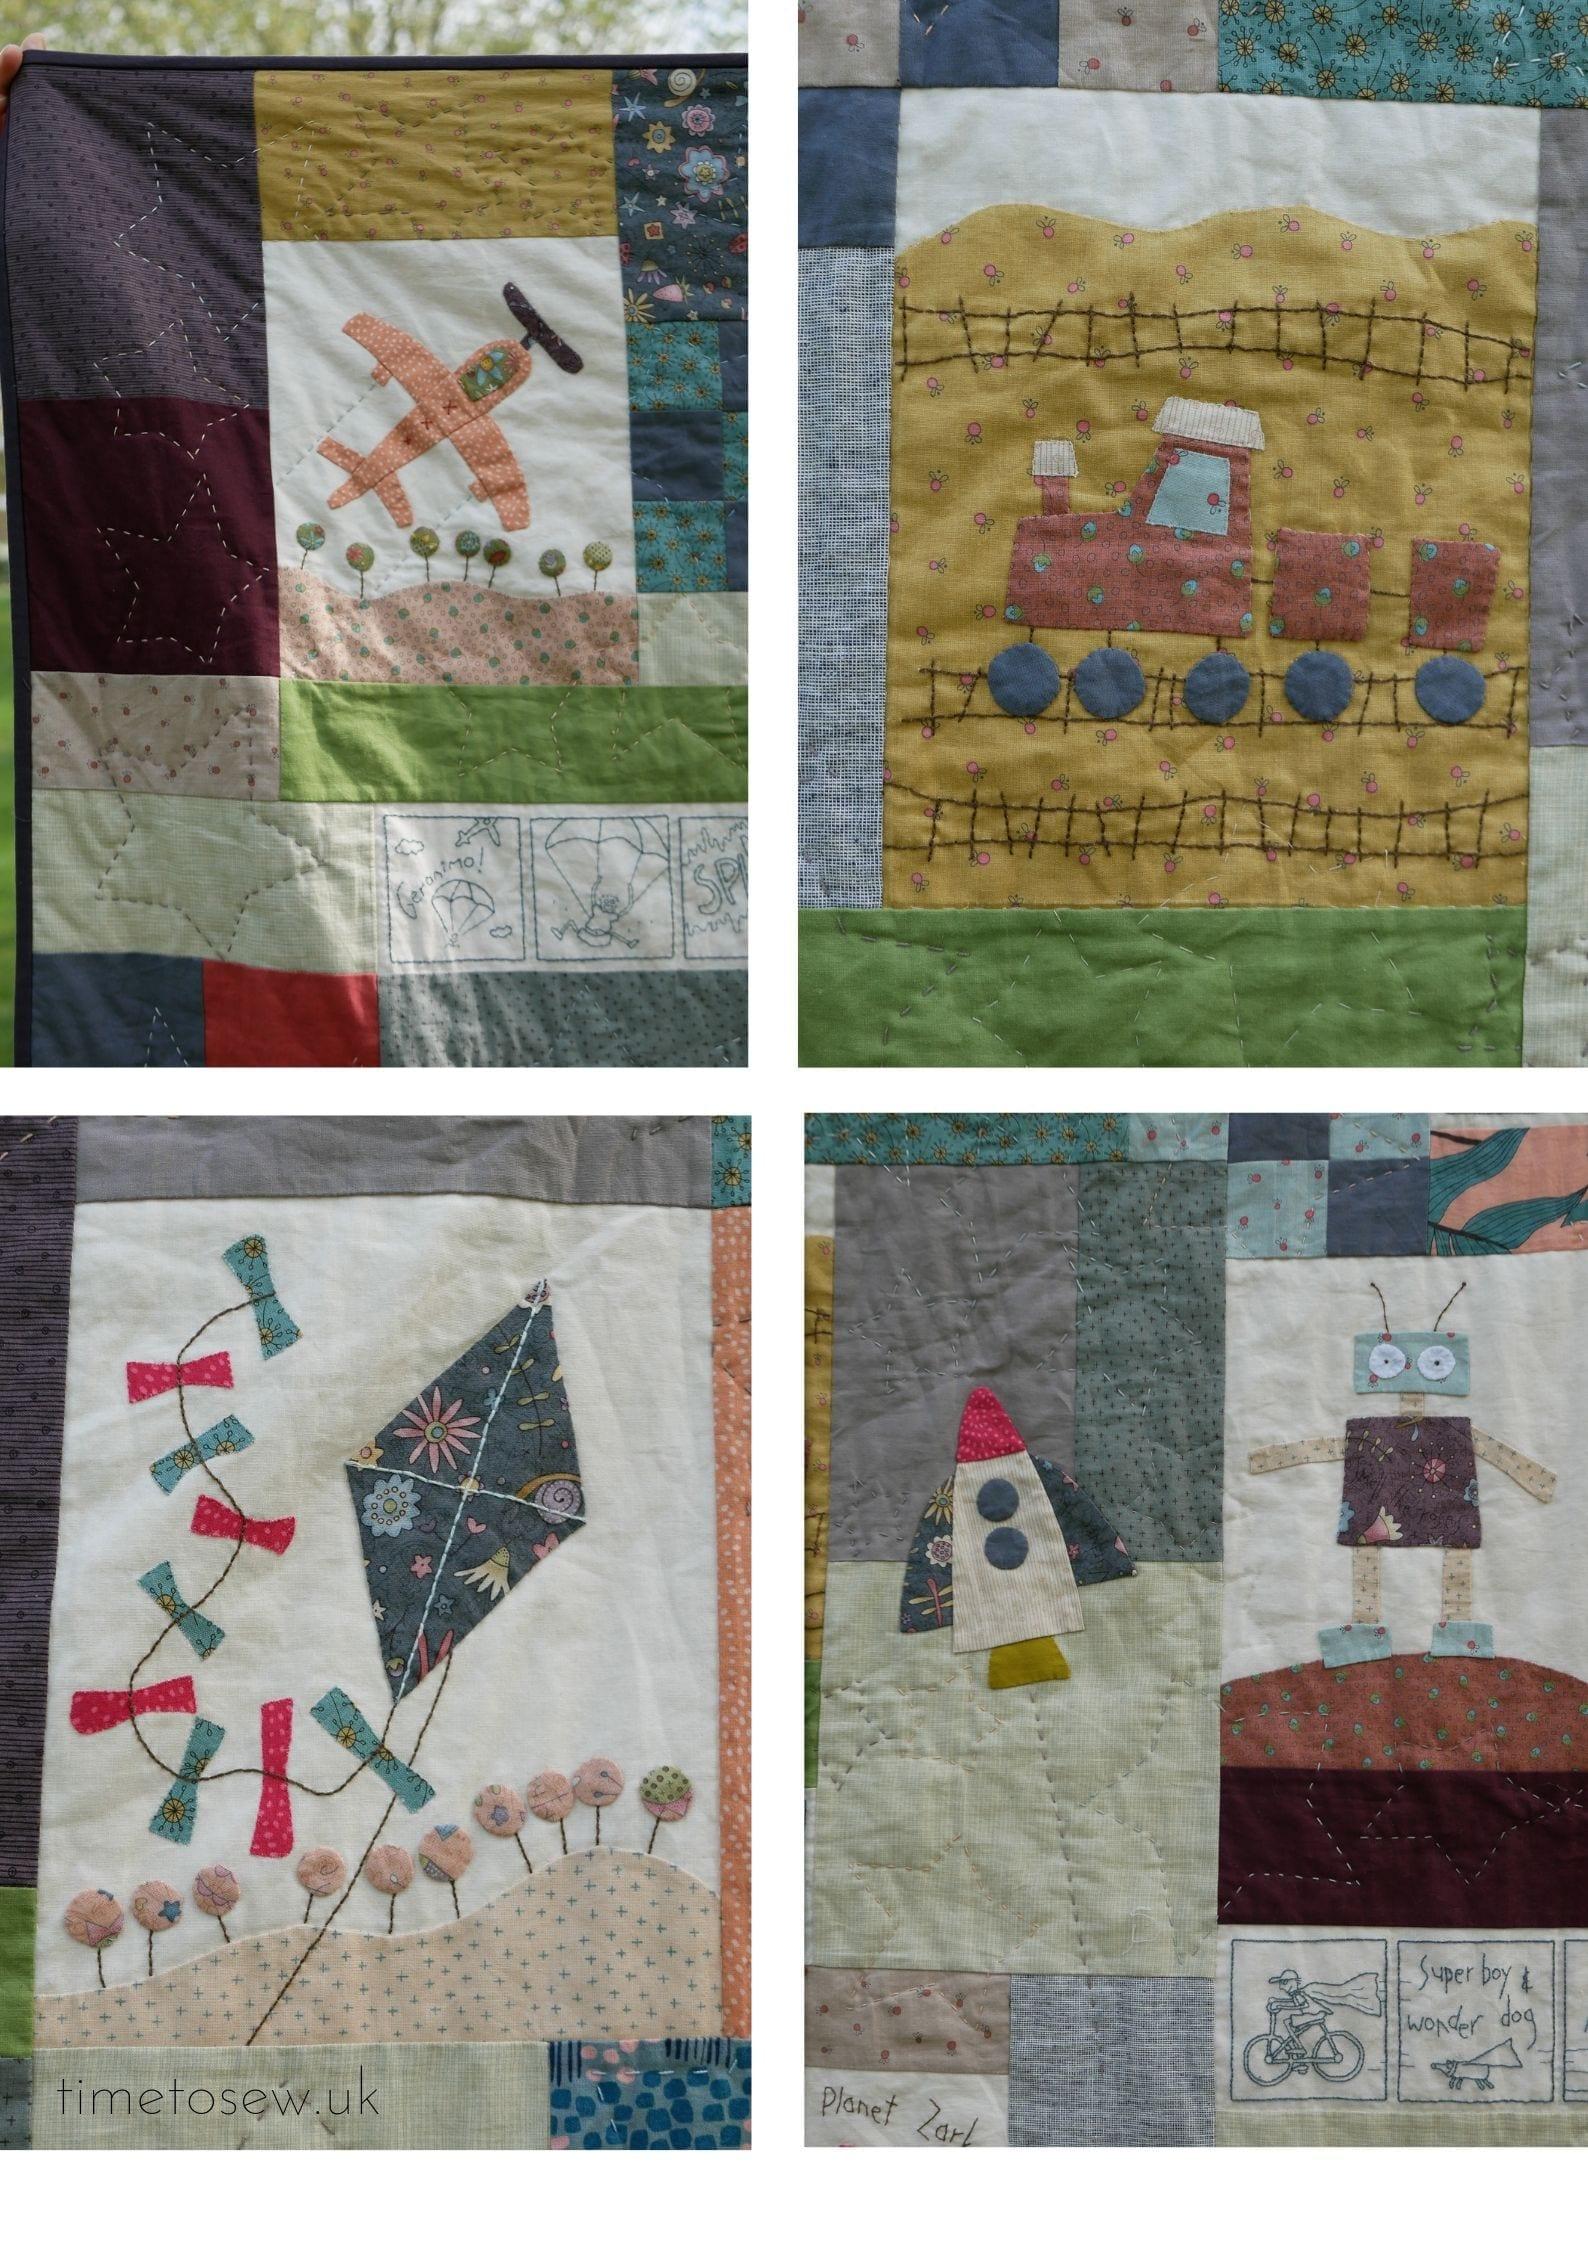 A boy's story quilt panel details